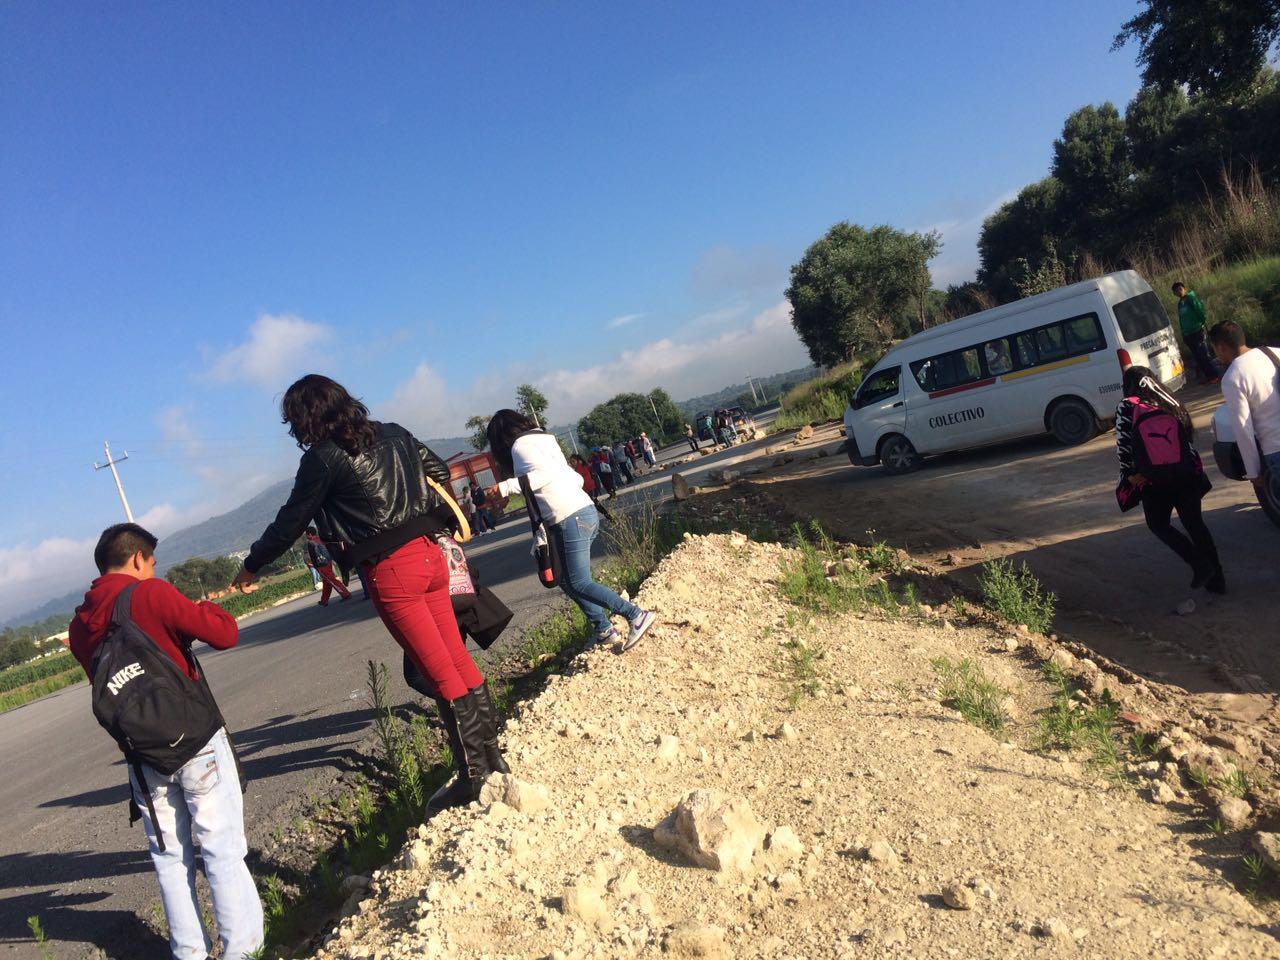 Bloquean en Xalpatlahuaya accesos de la carretera Huamantla-Terrenate